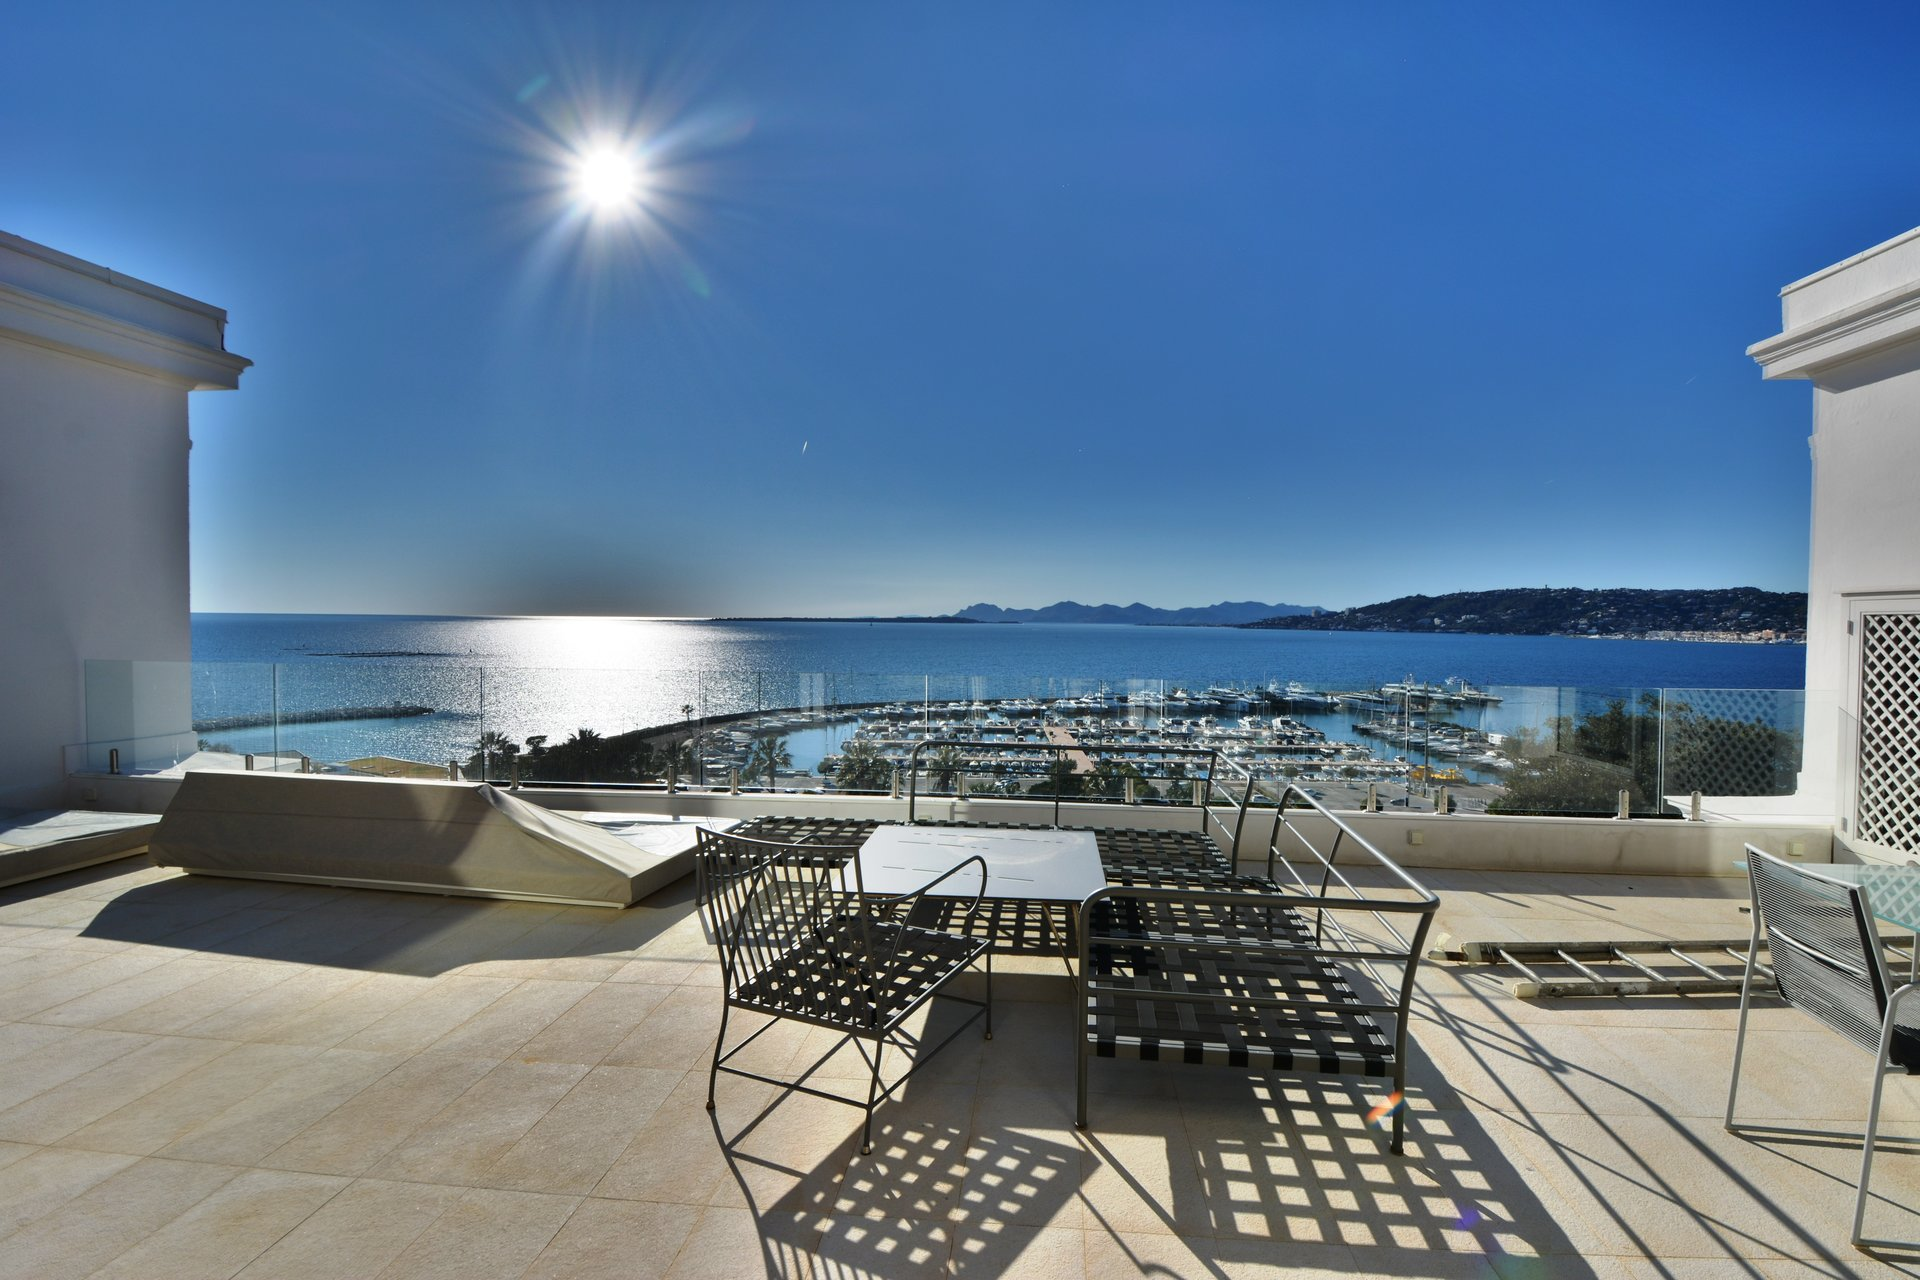 Пентхаус с видом на море рядом с Belles Rives - Жуан ле Пен